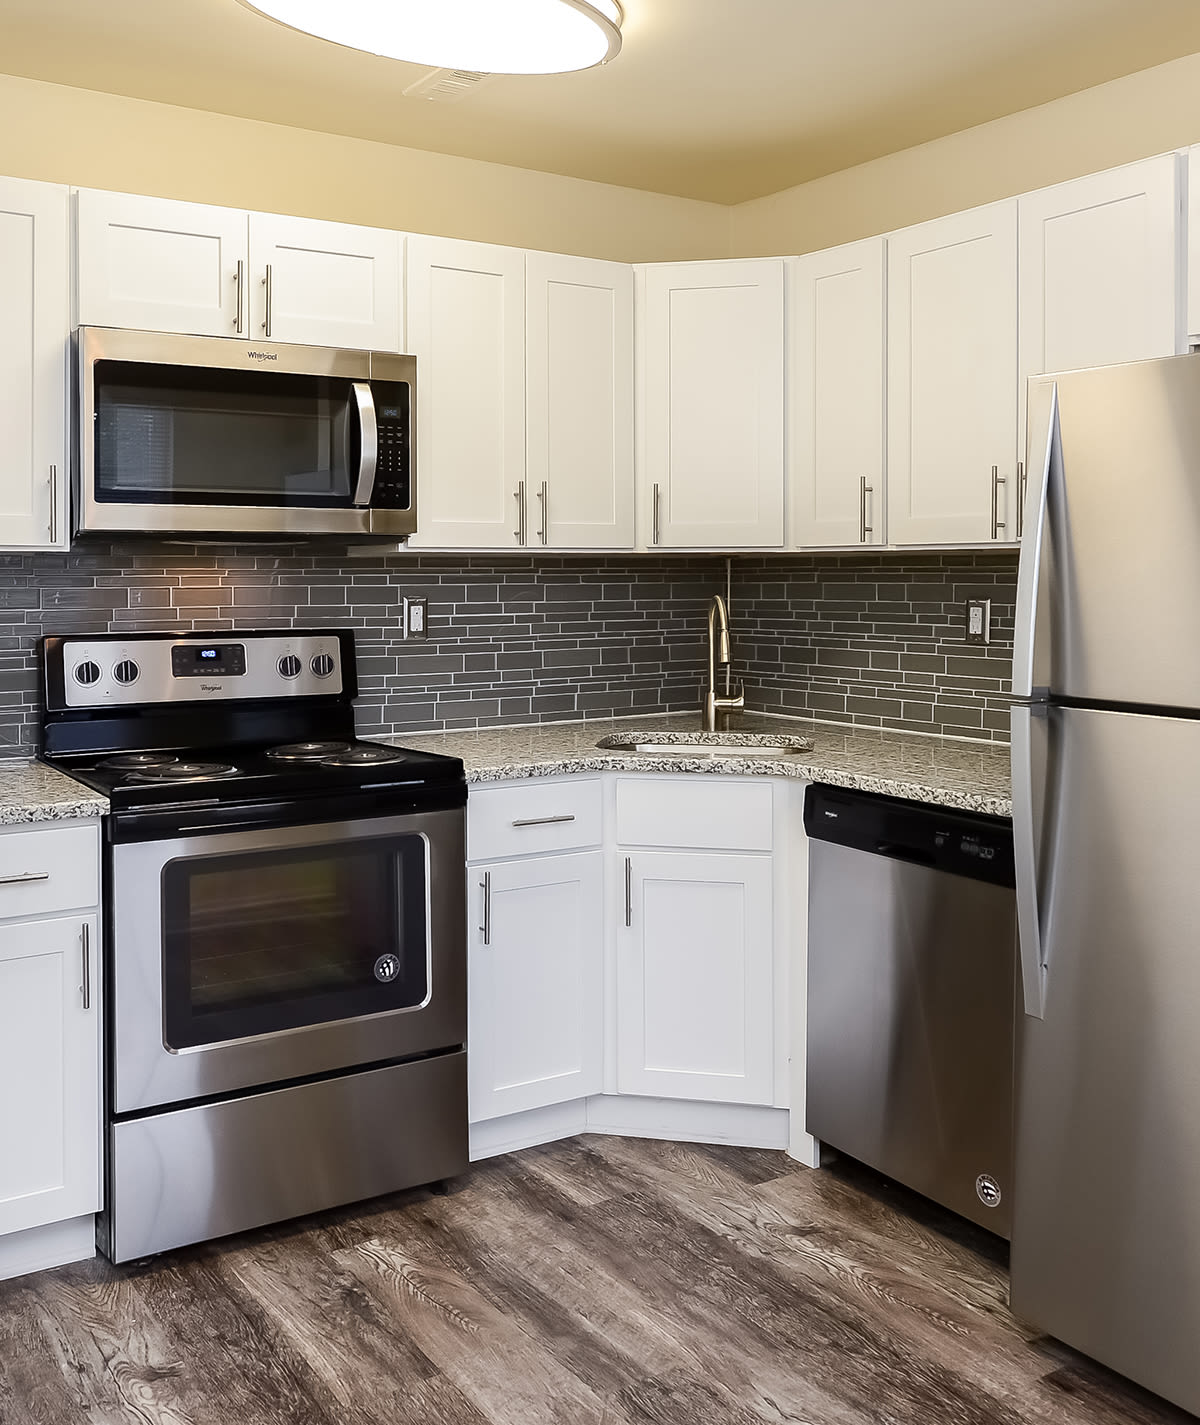 Nieuw Amsterdam Apartment Homes in Marlton, NJ